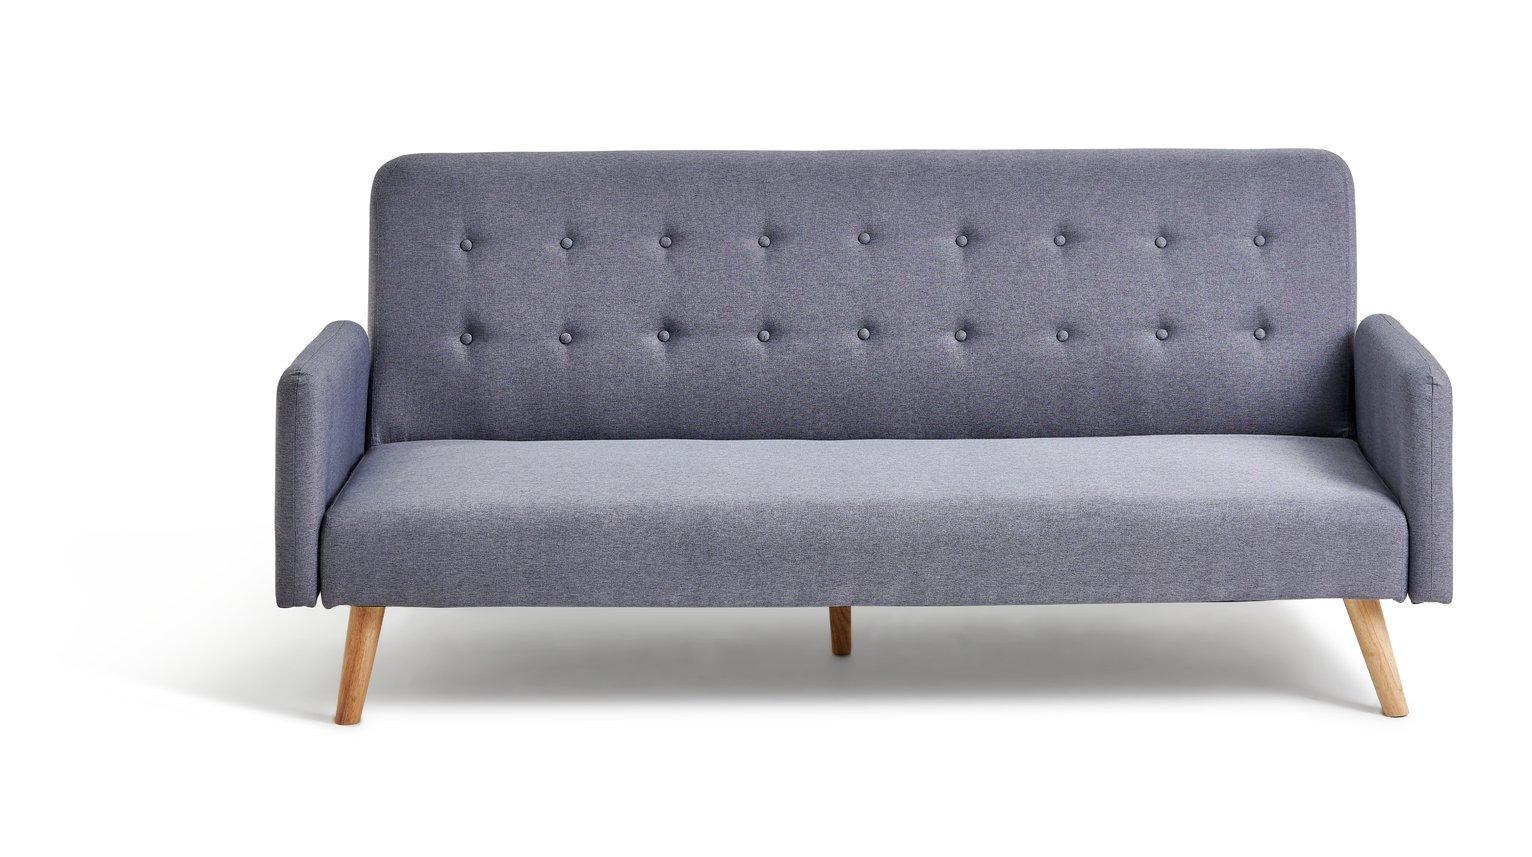 Argos Home Marseille Clic Clac Fabric Sofa Bed - Grey